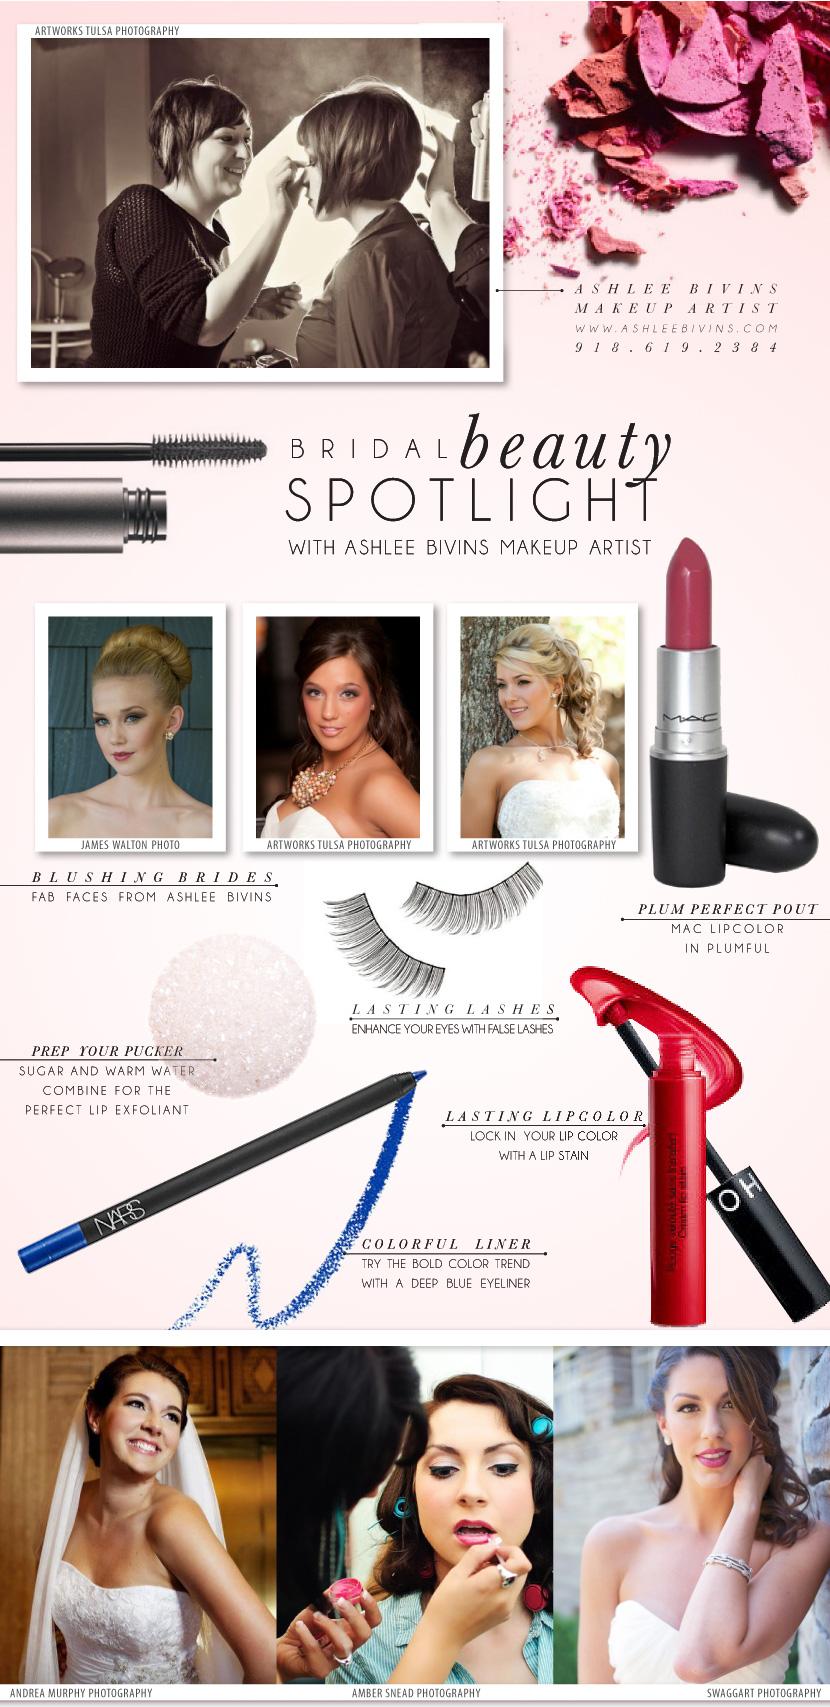 beautyspotlight_ashleebivins_blog